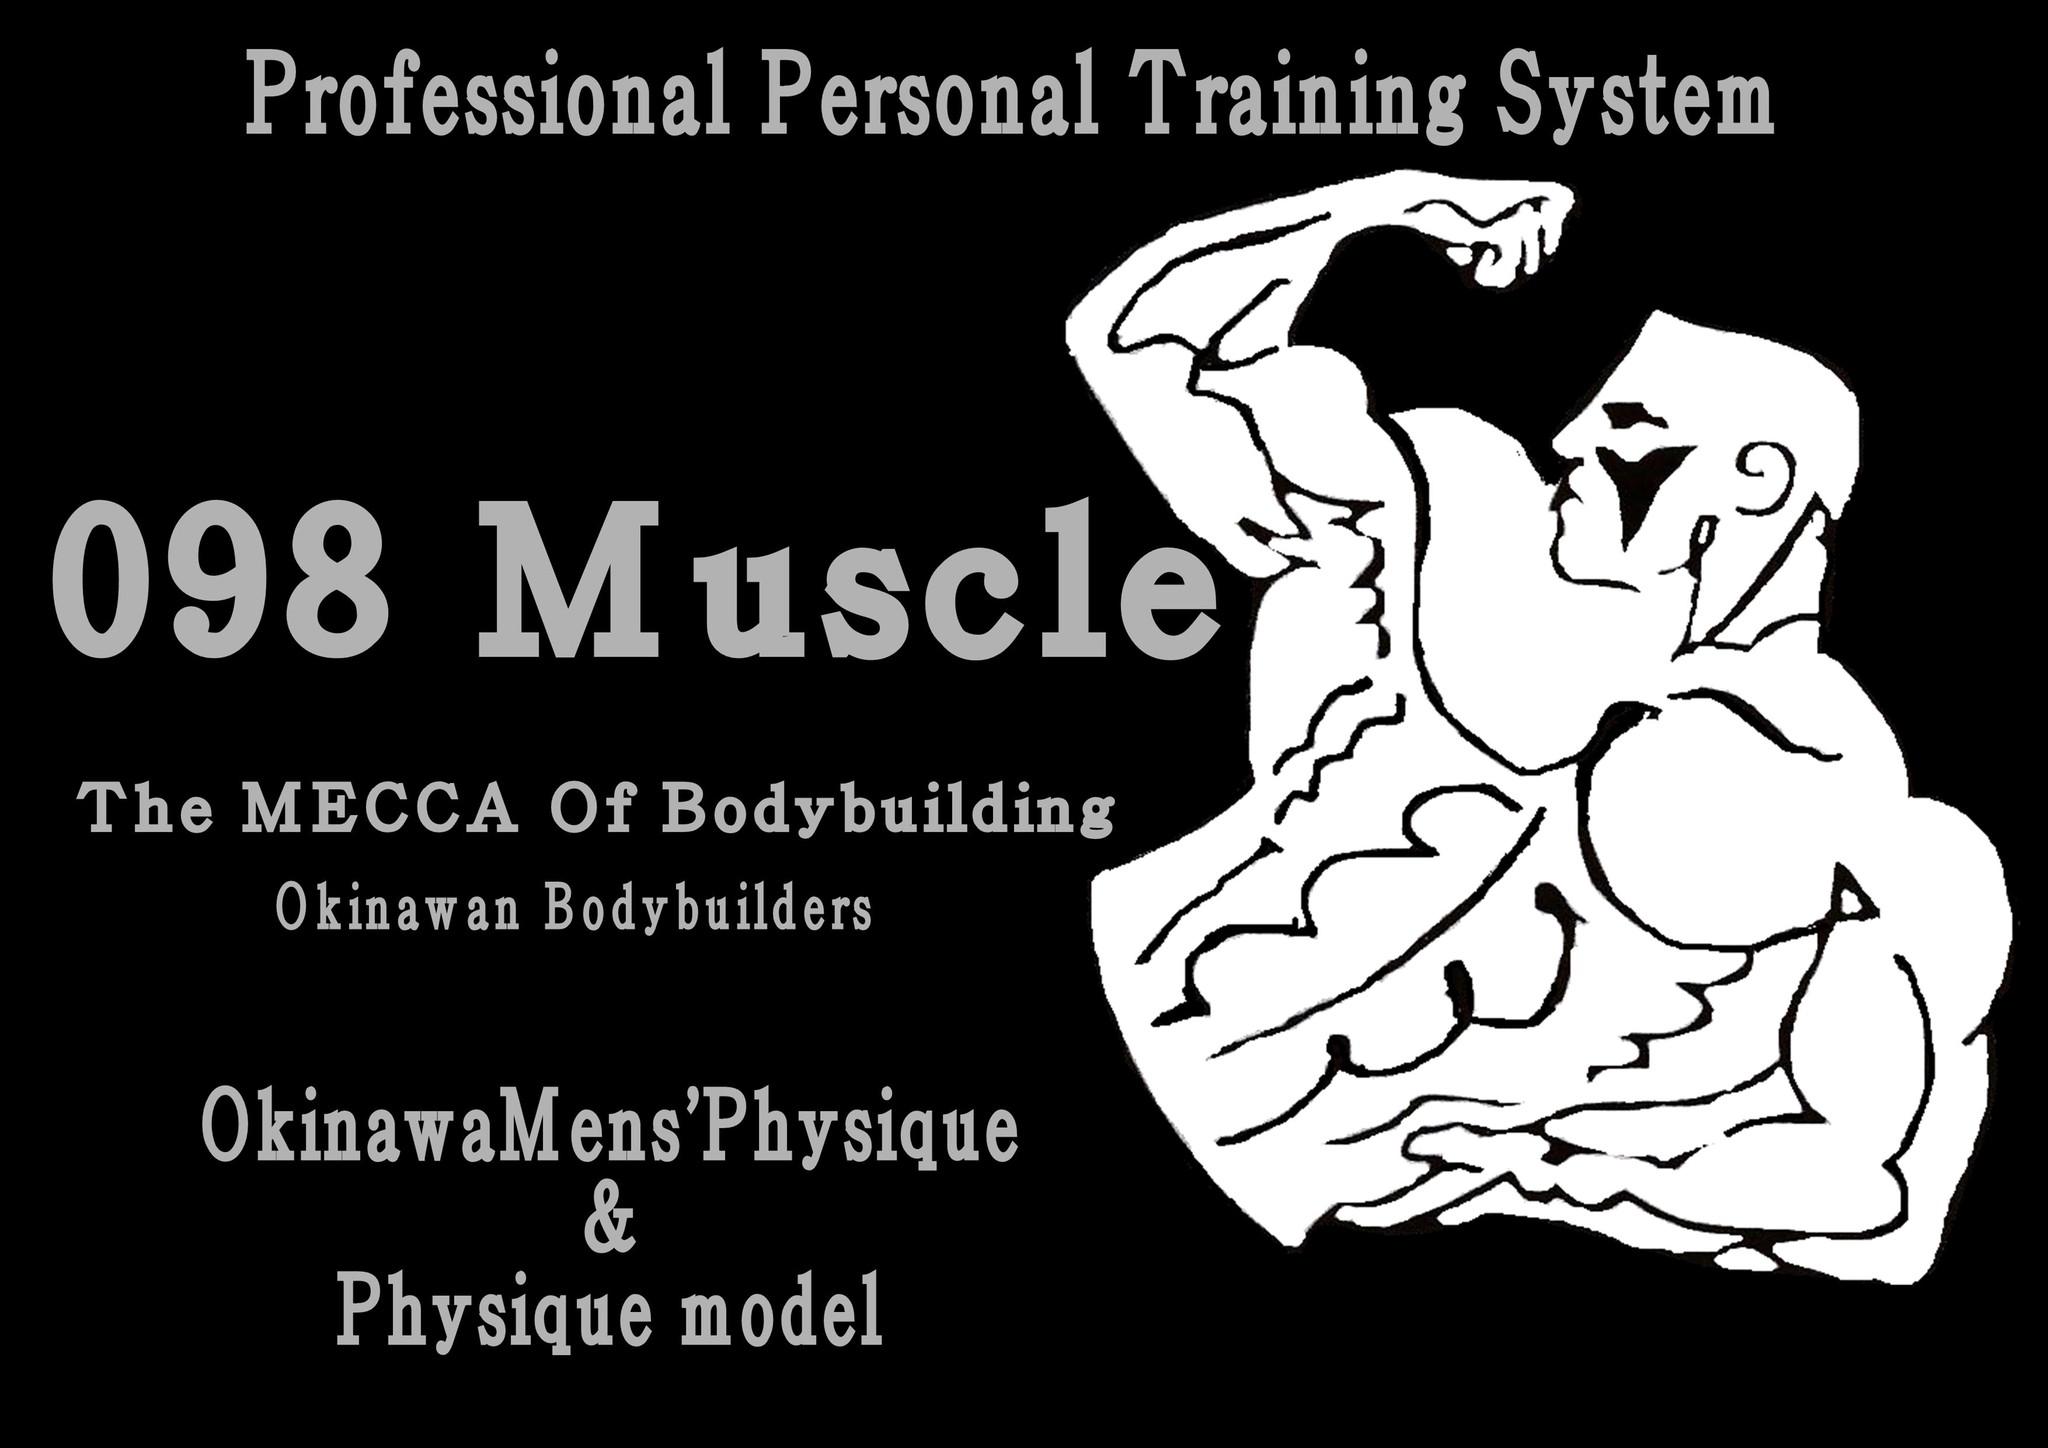 OkinawaMens'Physique&ModelPhysique Apparel Shop